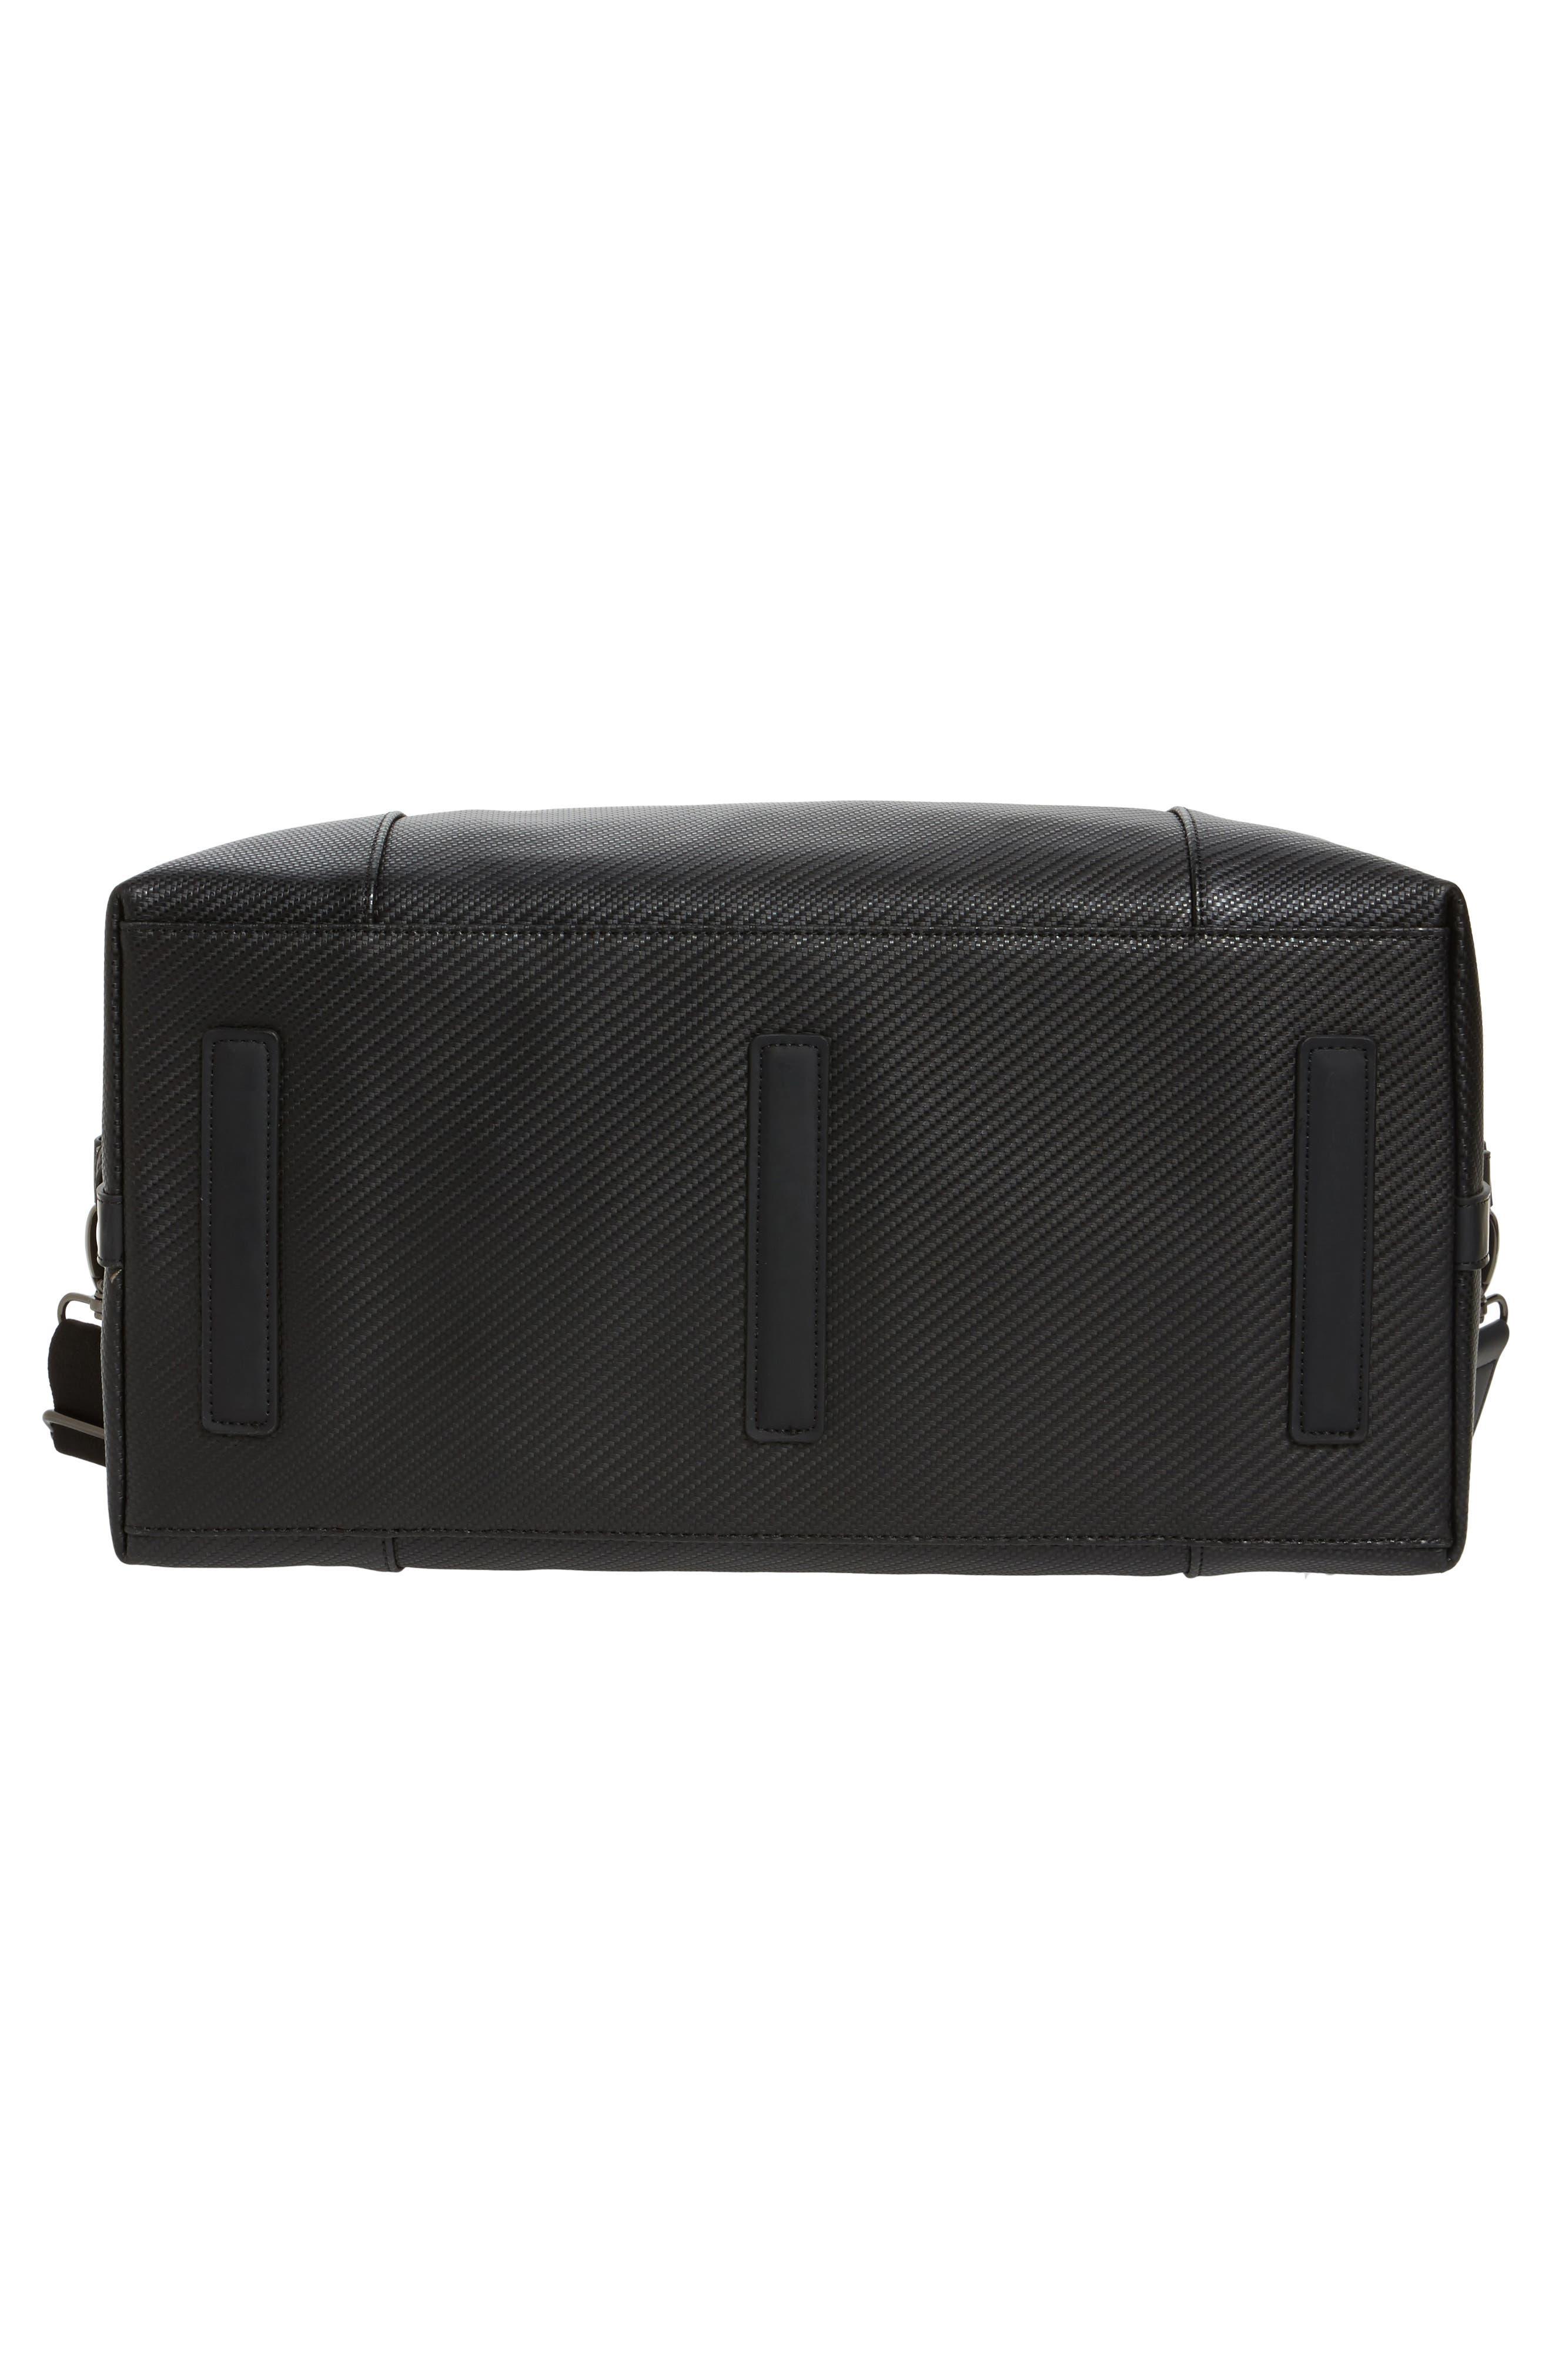 Novana Leather Duffel Bag,                             Alternate thumbnail 6, color,